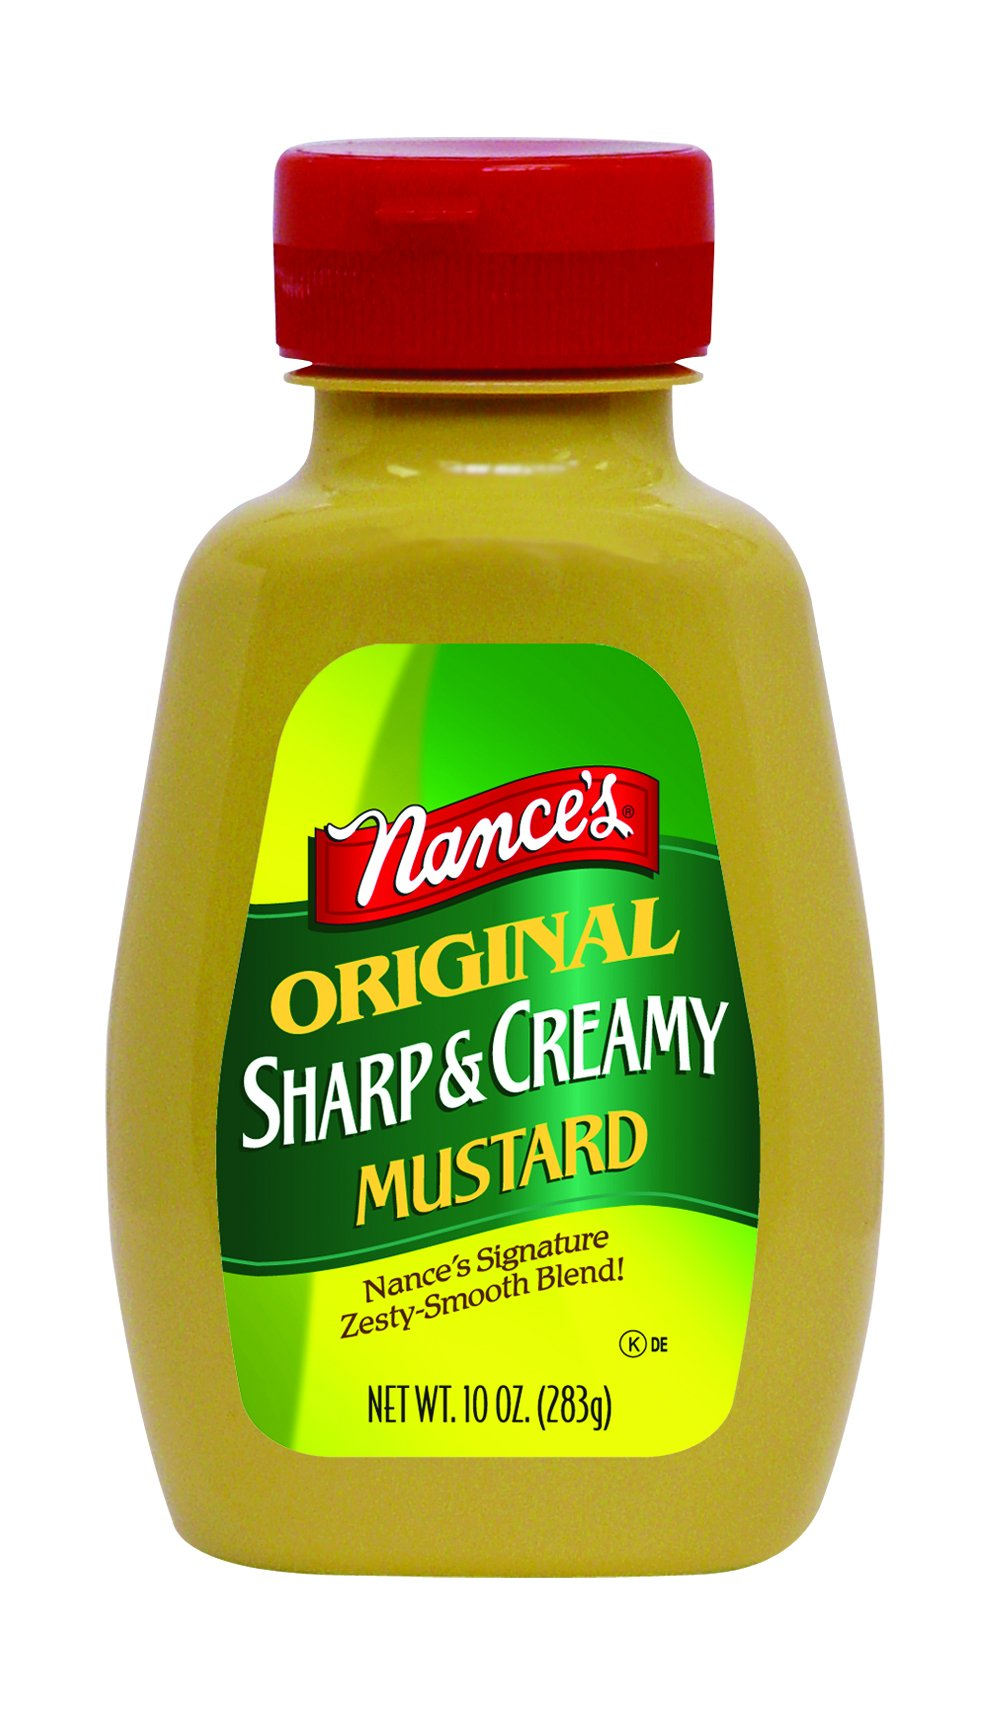 Nance's Mustard Sharp & Creamy, 10-Ounces  (Pack of 6)